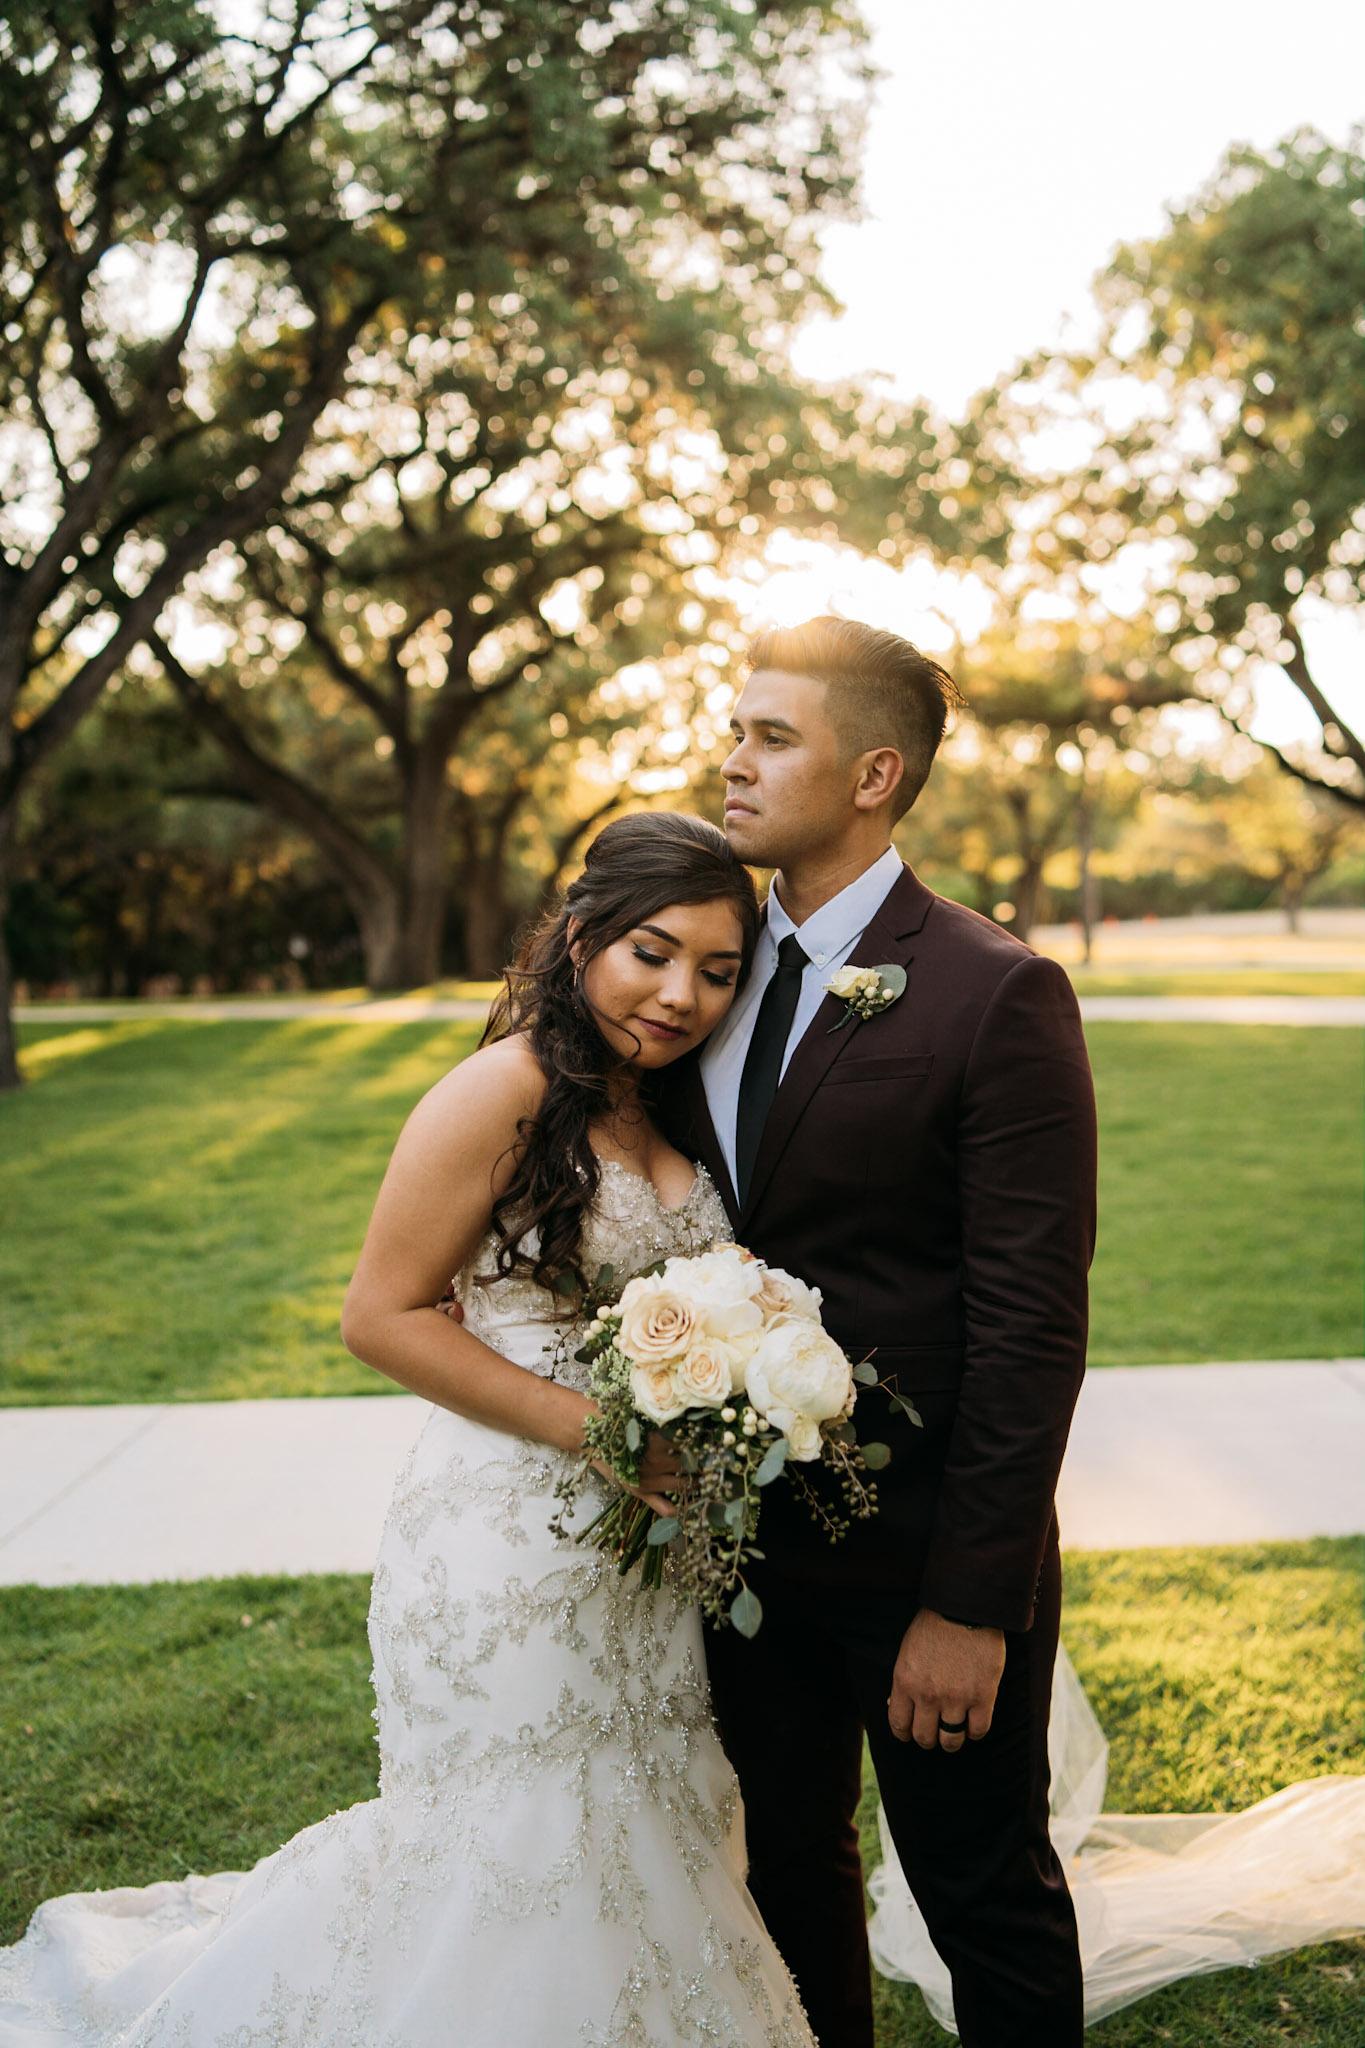 060718-A-JoeDel-Wedding-AdrianRGarcia-FOMAScine_AA98374.jpg